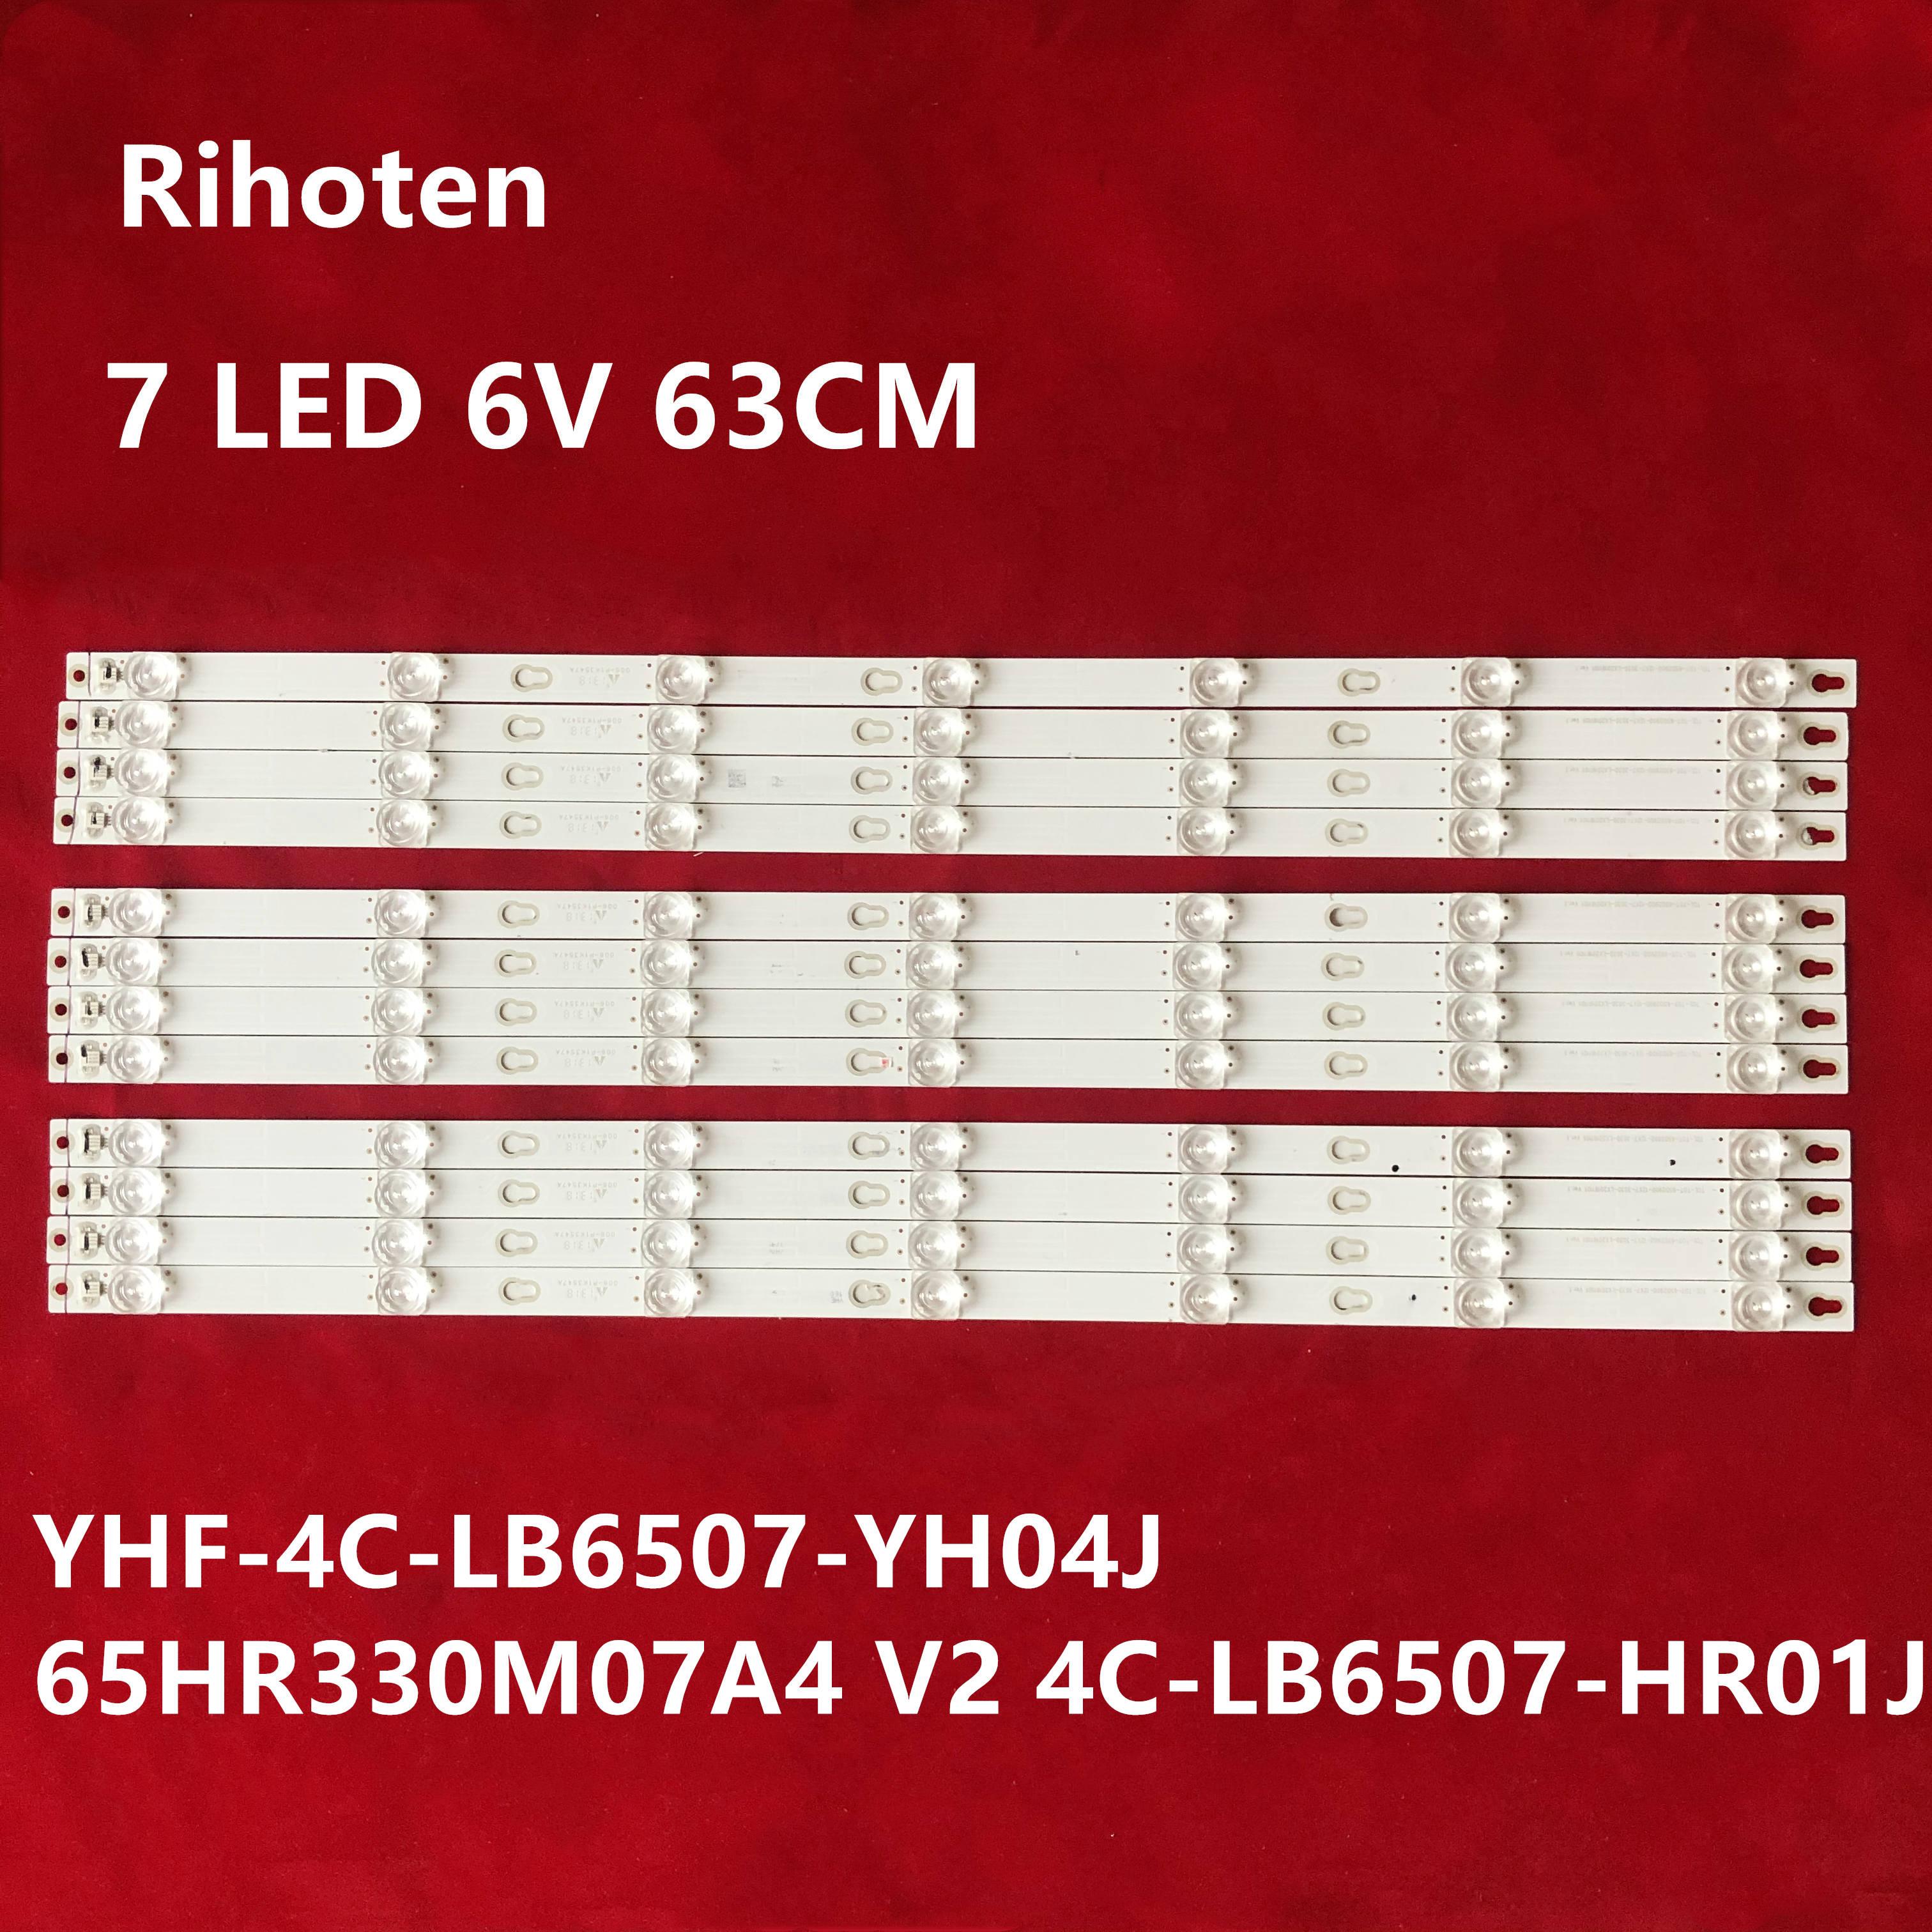 Para TCL L65E5800A-UD L65P2-UD 65A730U D65A620U Luz de tira 65HR330M07A4 V2 4C-LB6507-HR01J pantalla LVU650NDIL